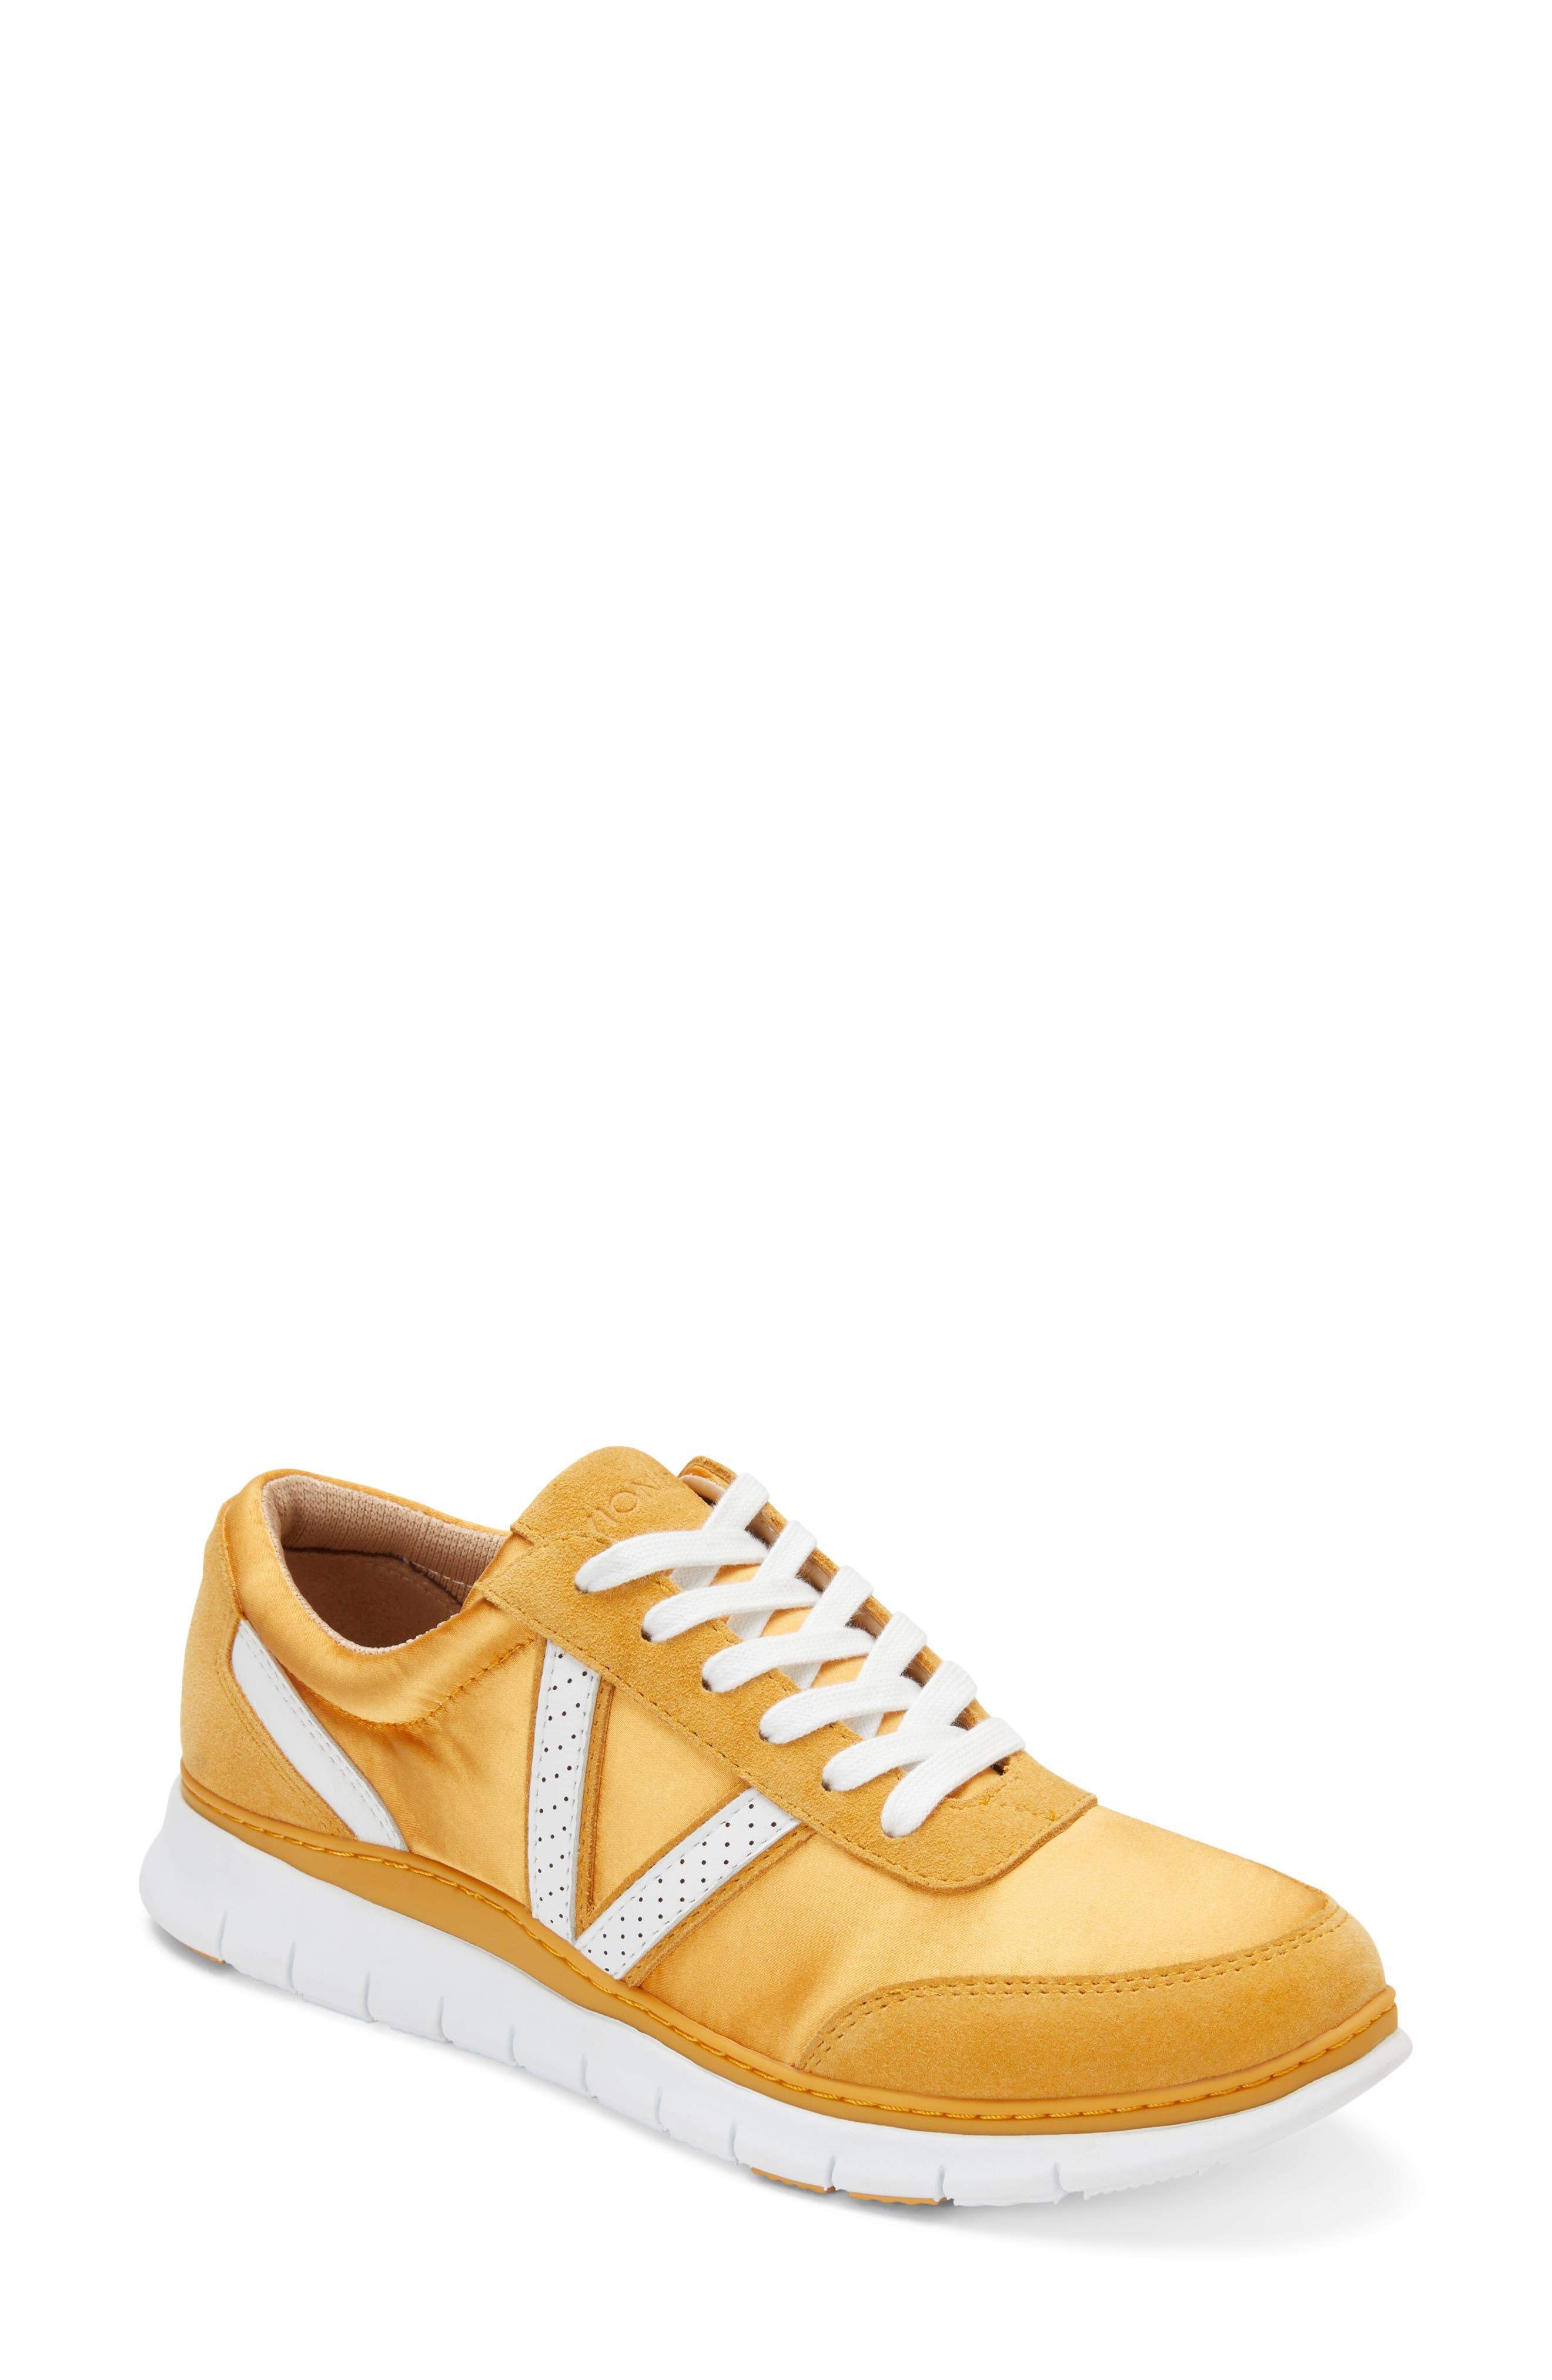 Women's Yellow Vionic Shoes | Nordstrom